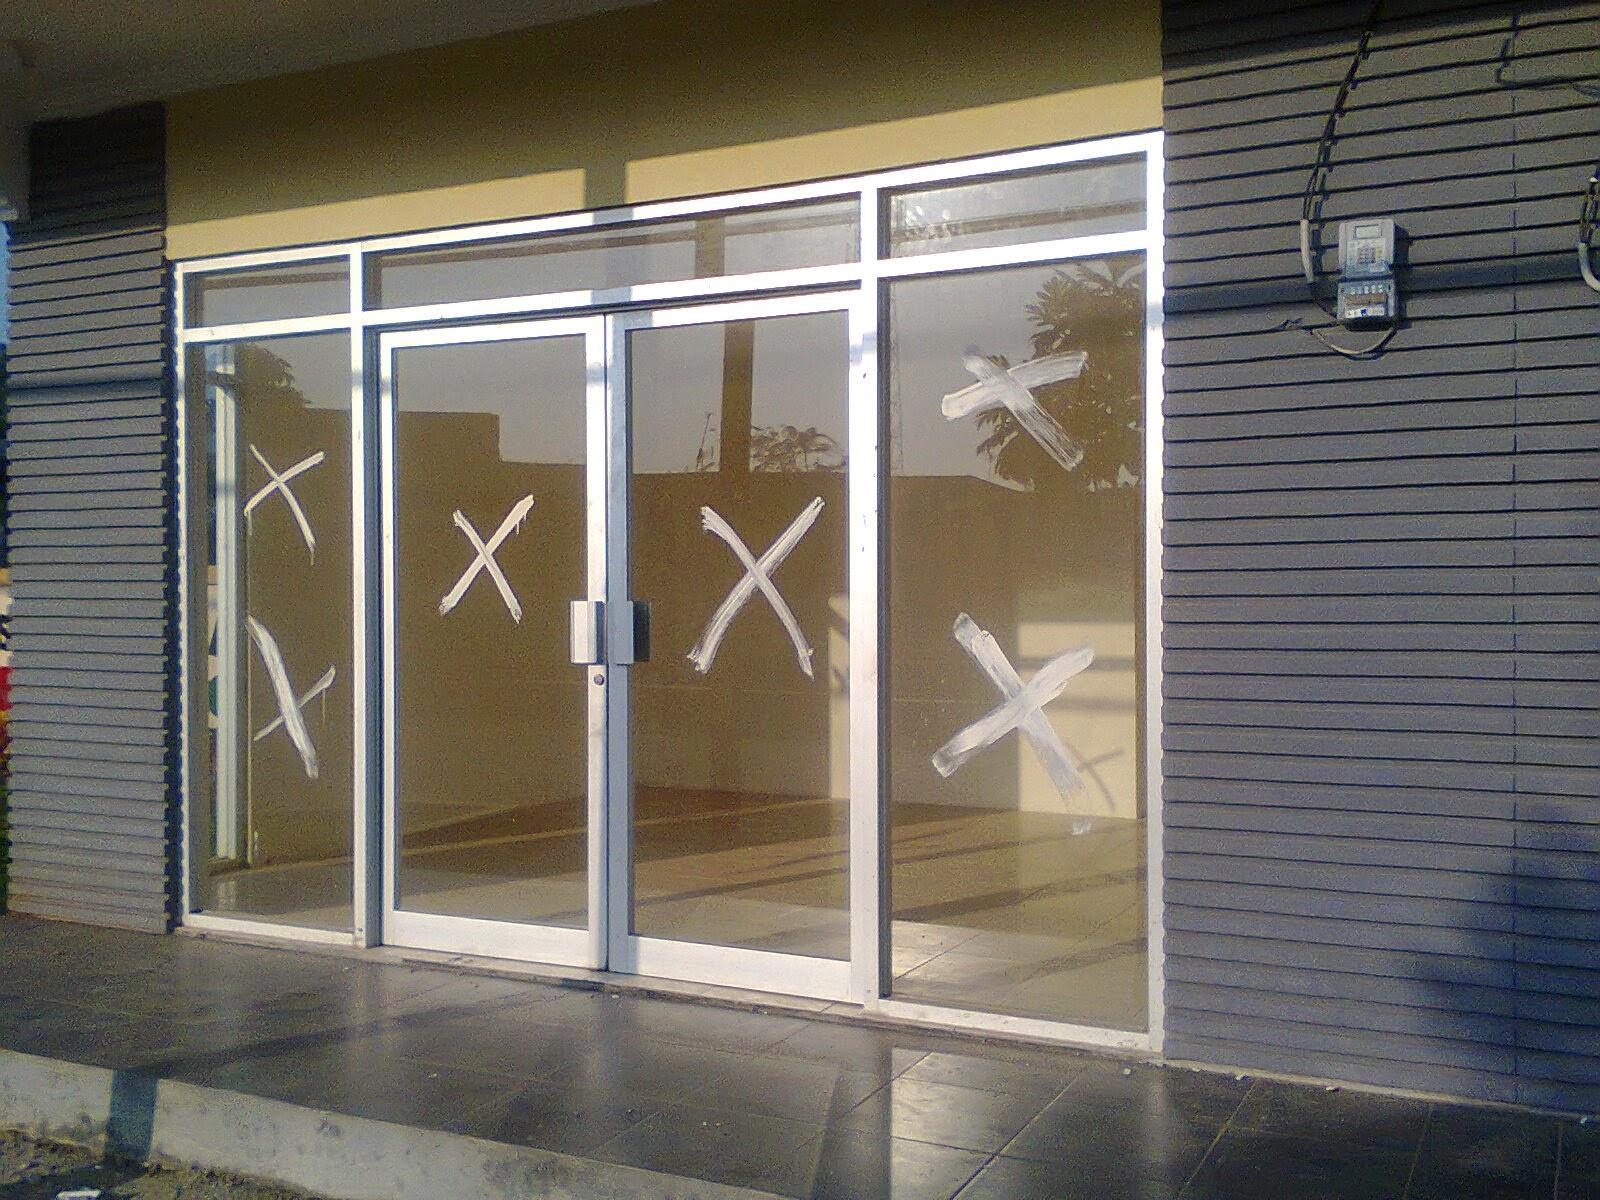 KUSEN PINTU ALUMINIUM: harga jual kusen pintu jendela ...